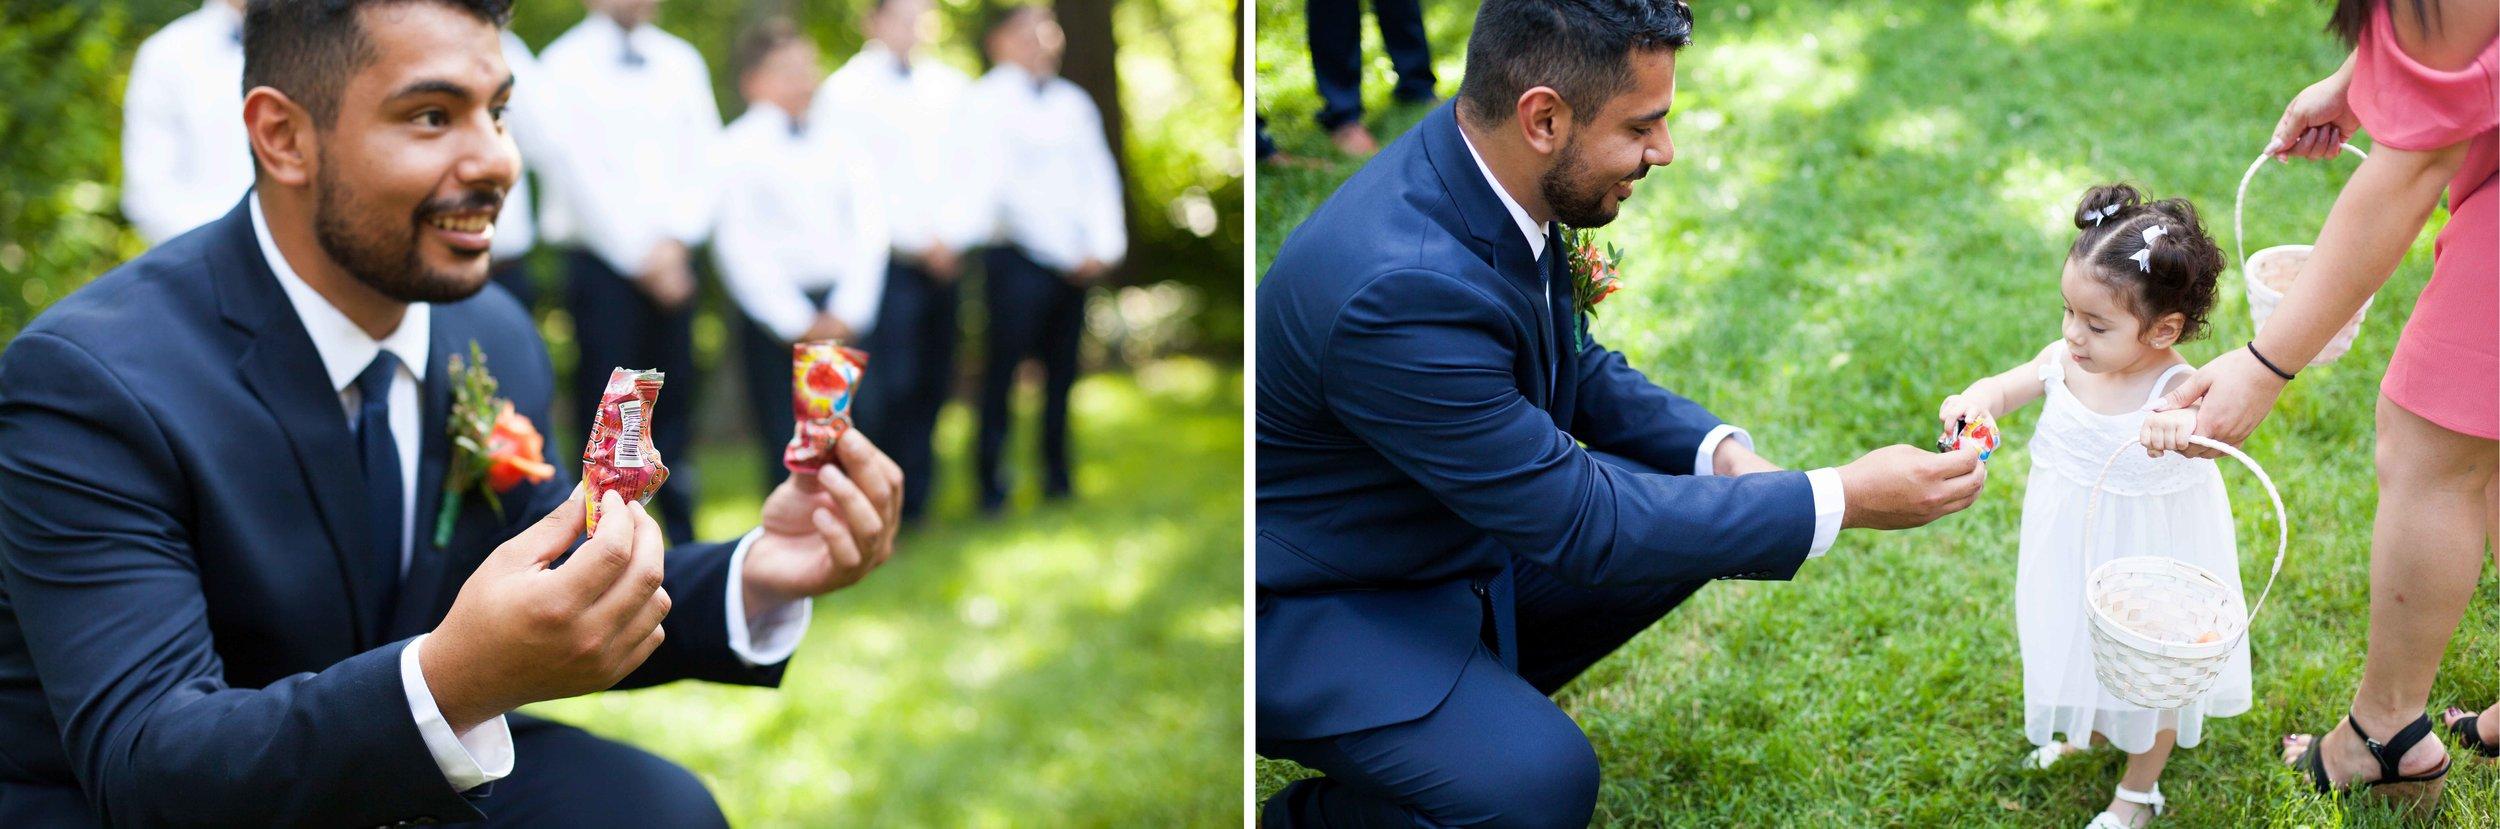 dd cincinnati wedding photographer ceremony0004.jpg